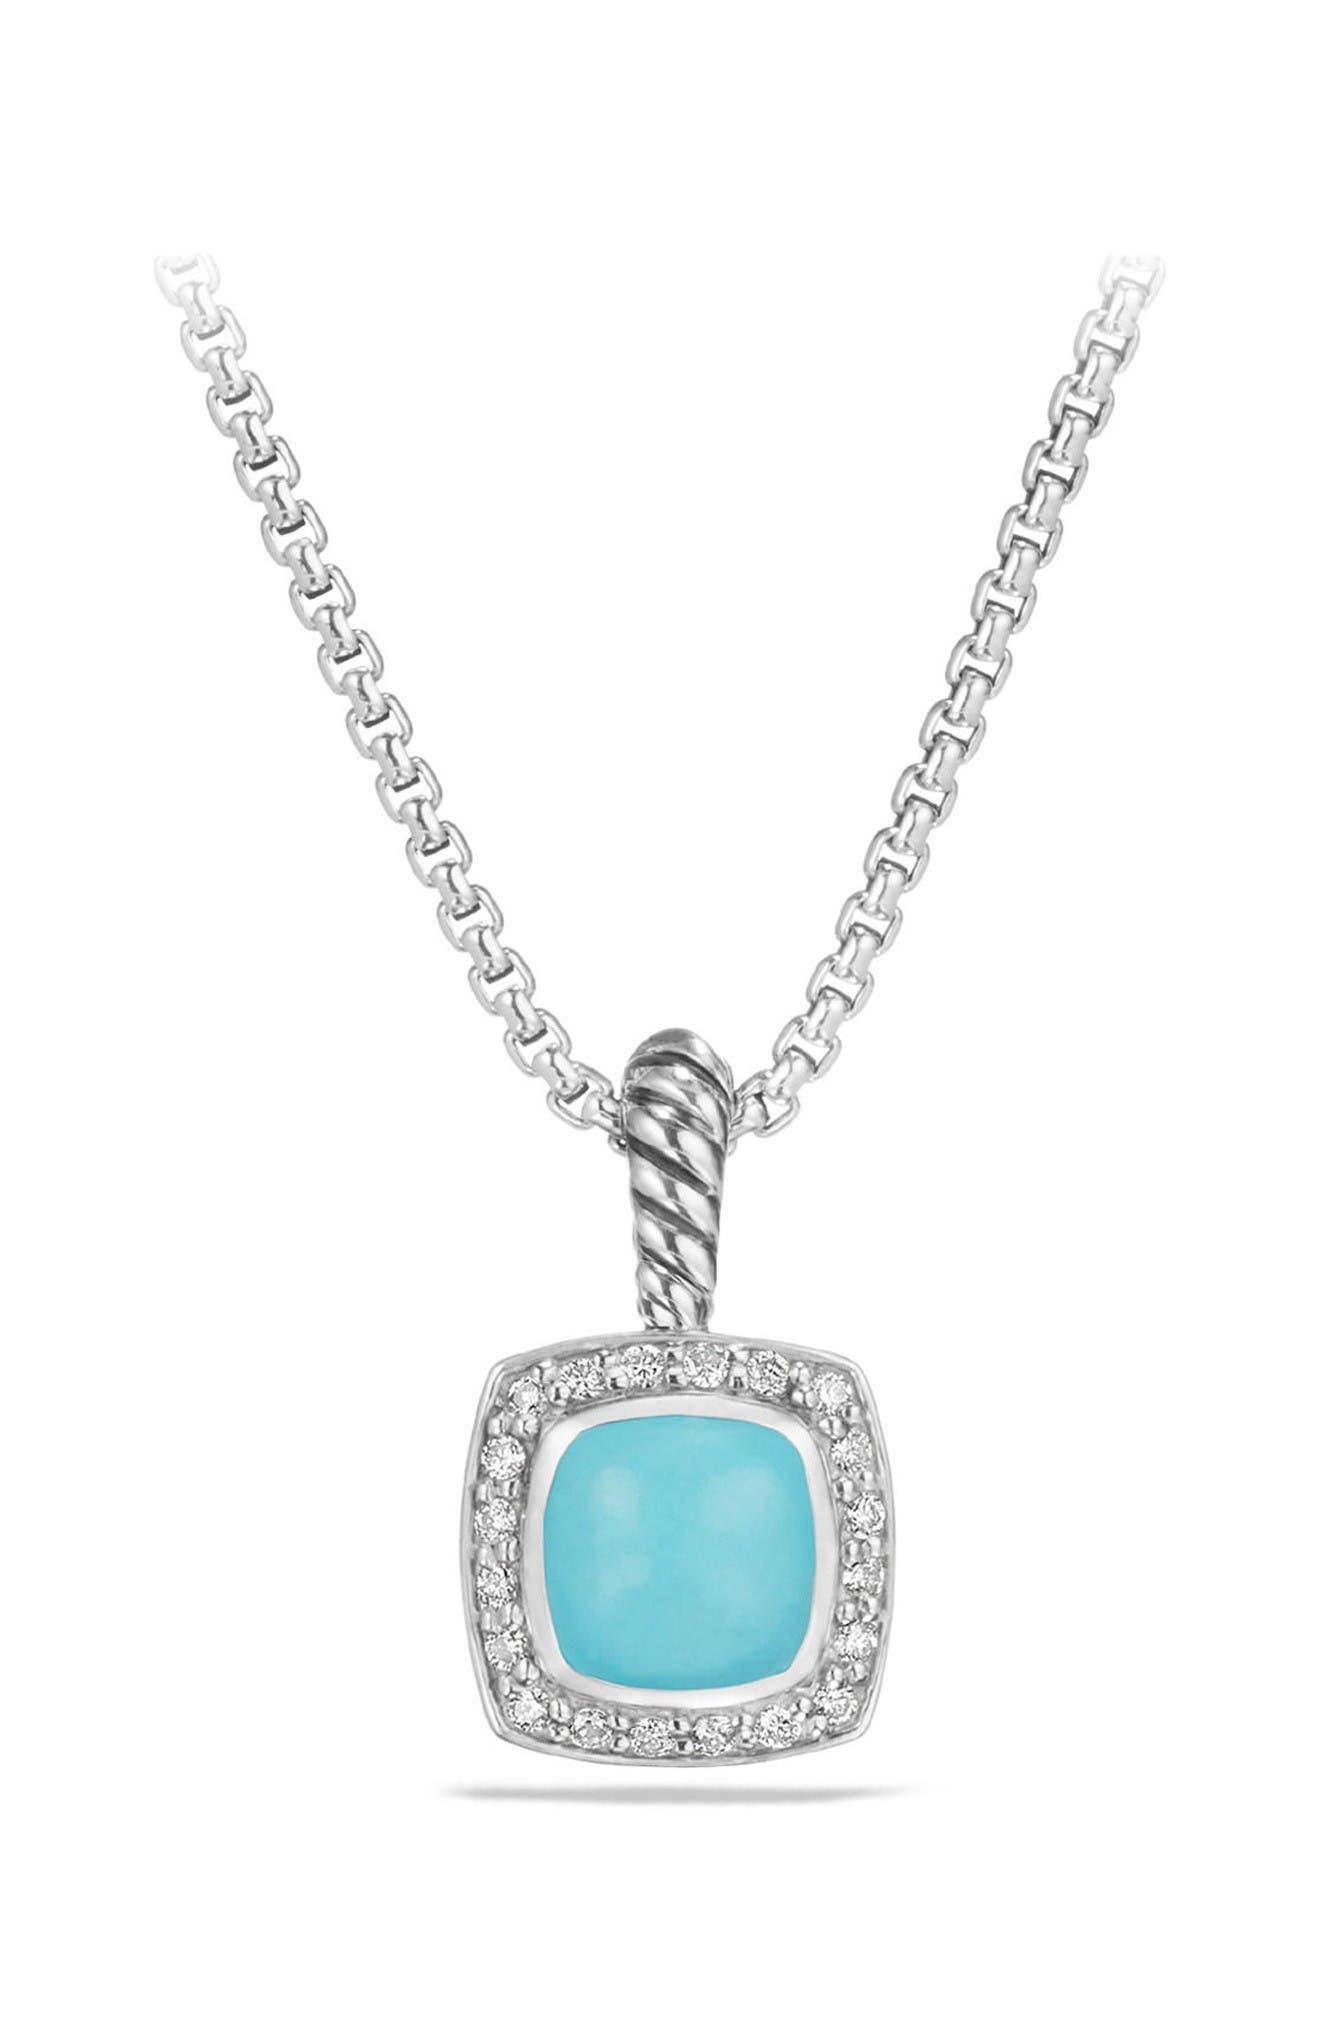 Main Image - David Yurman Petite Albion® Pendant Necklace with Diamonds